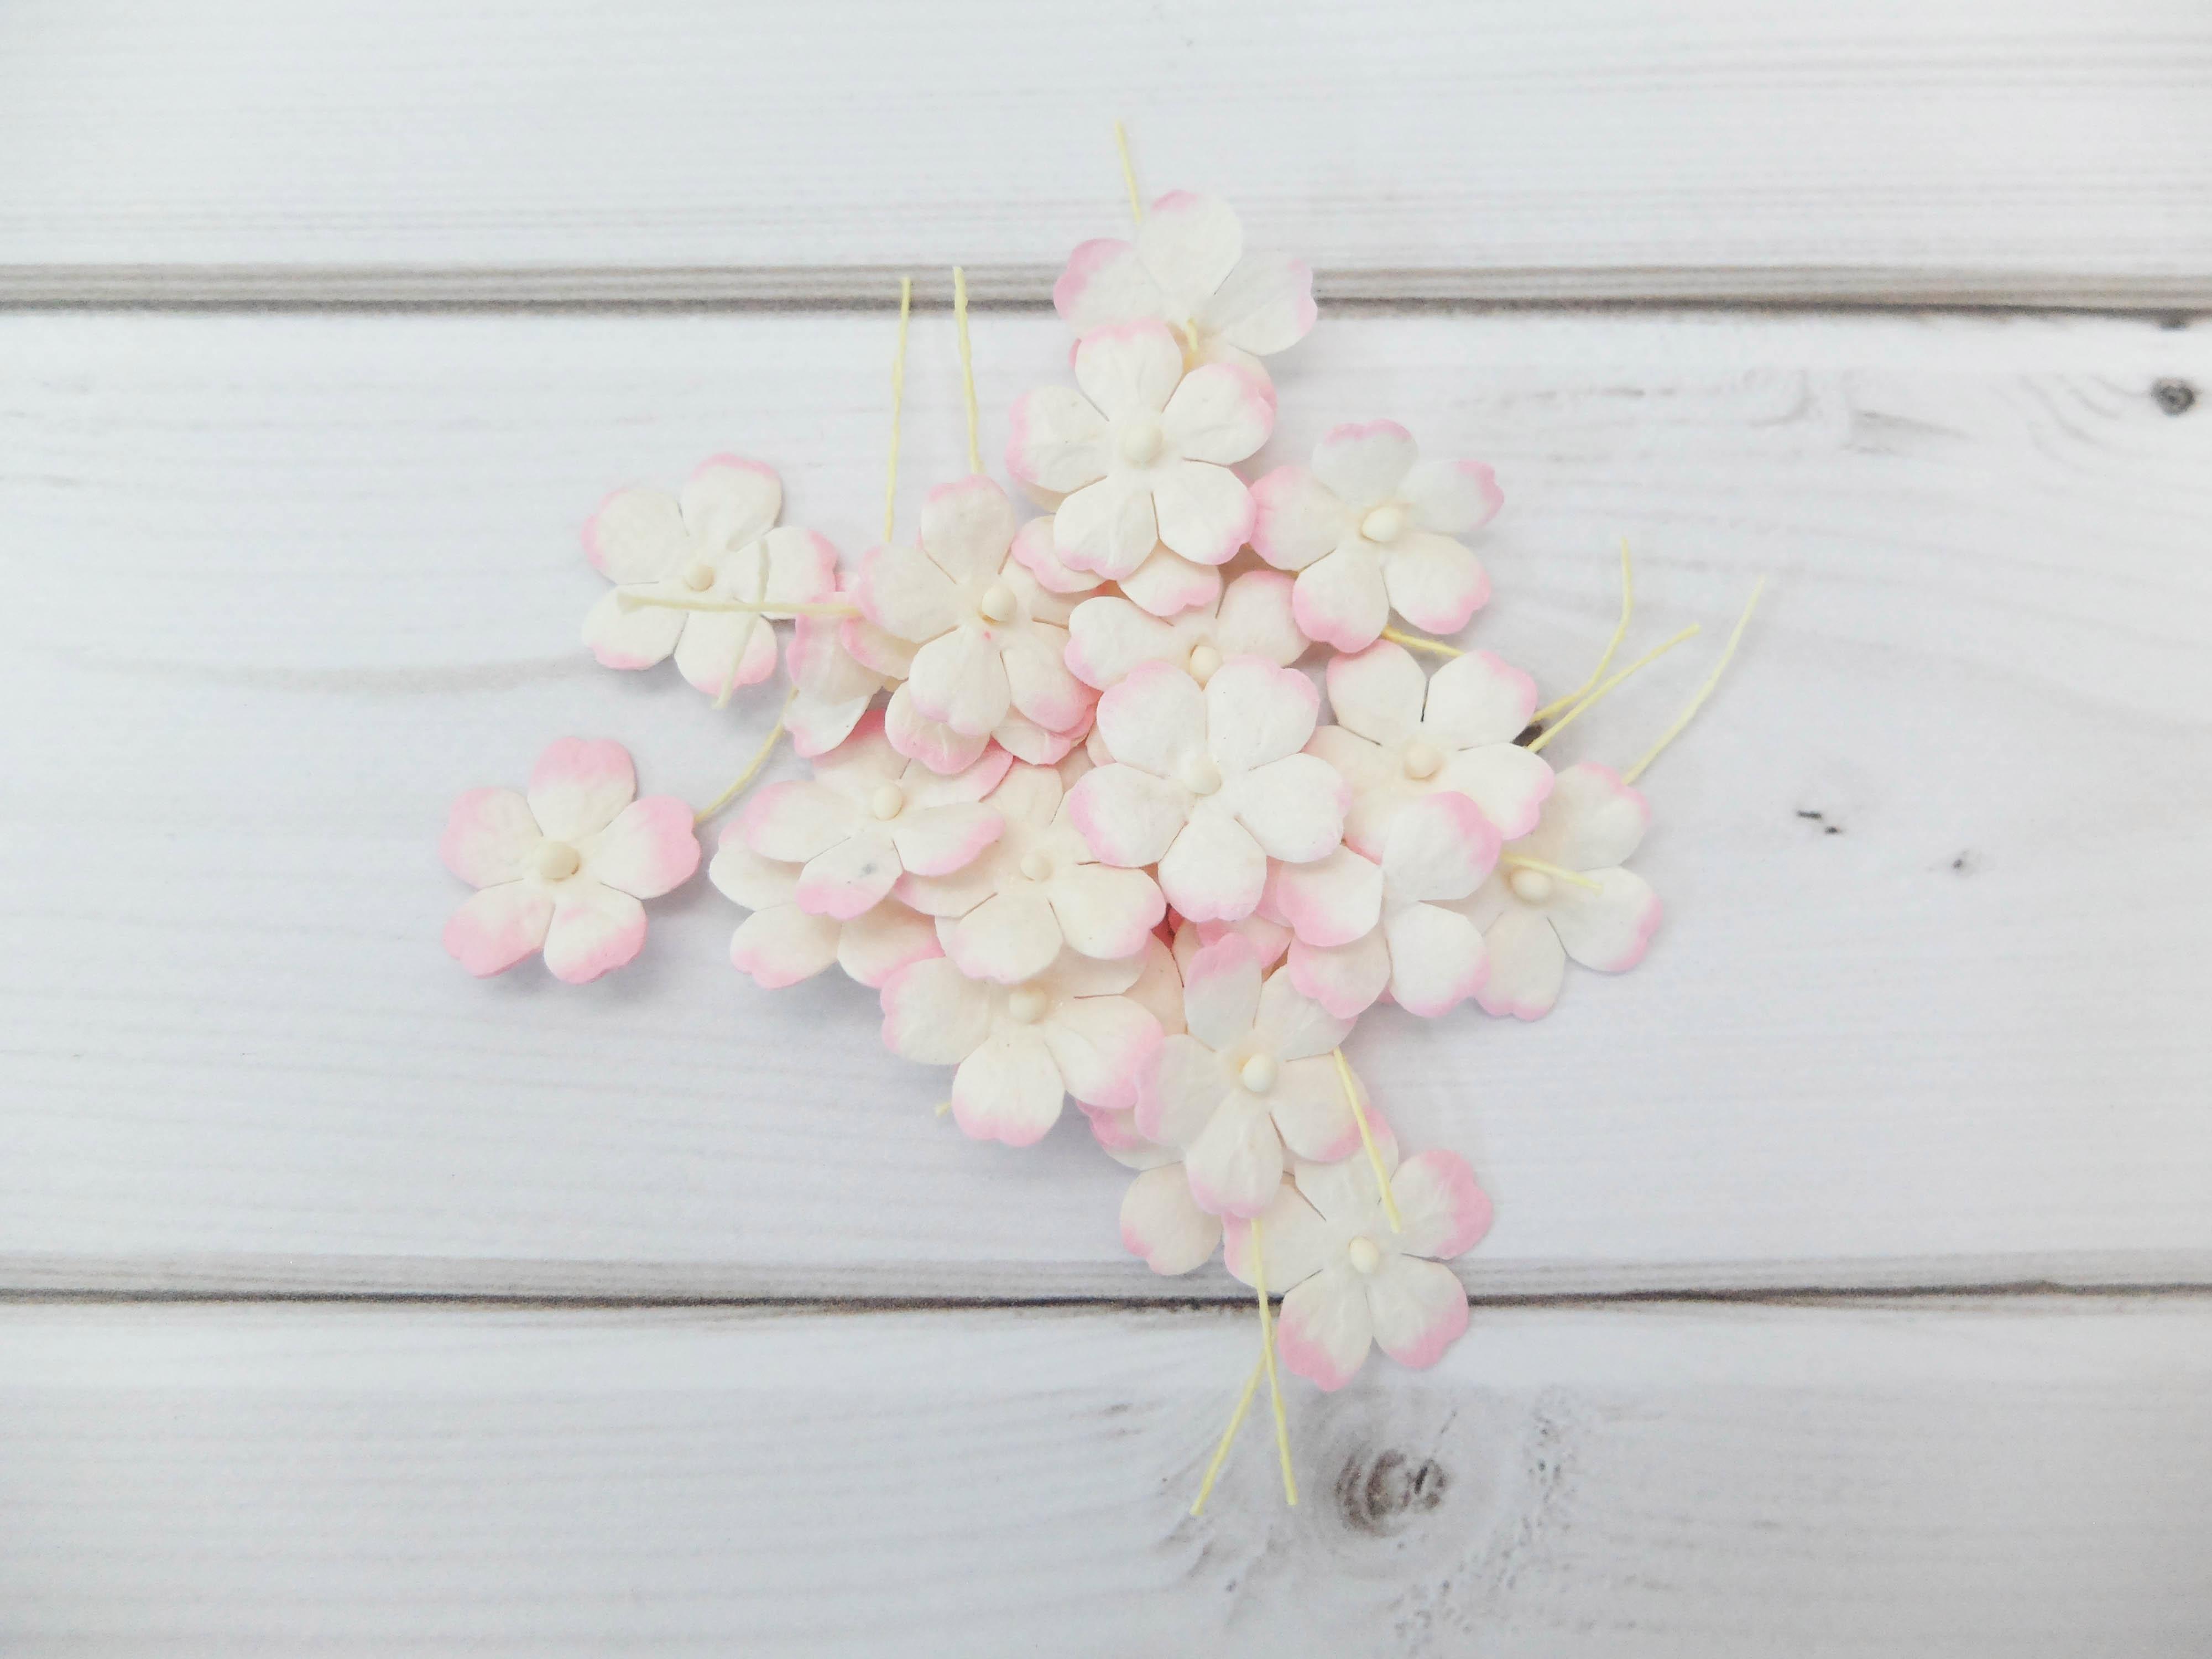 20mm paper flower embellishments 100 pcs mulberry paper flat 20mm paper flower embellishments mightylinksfo